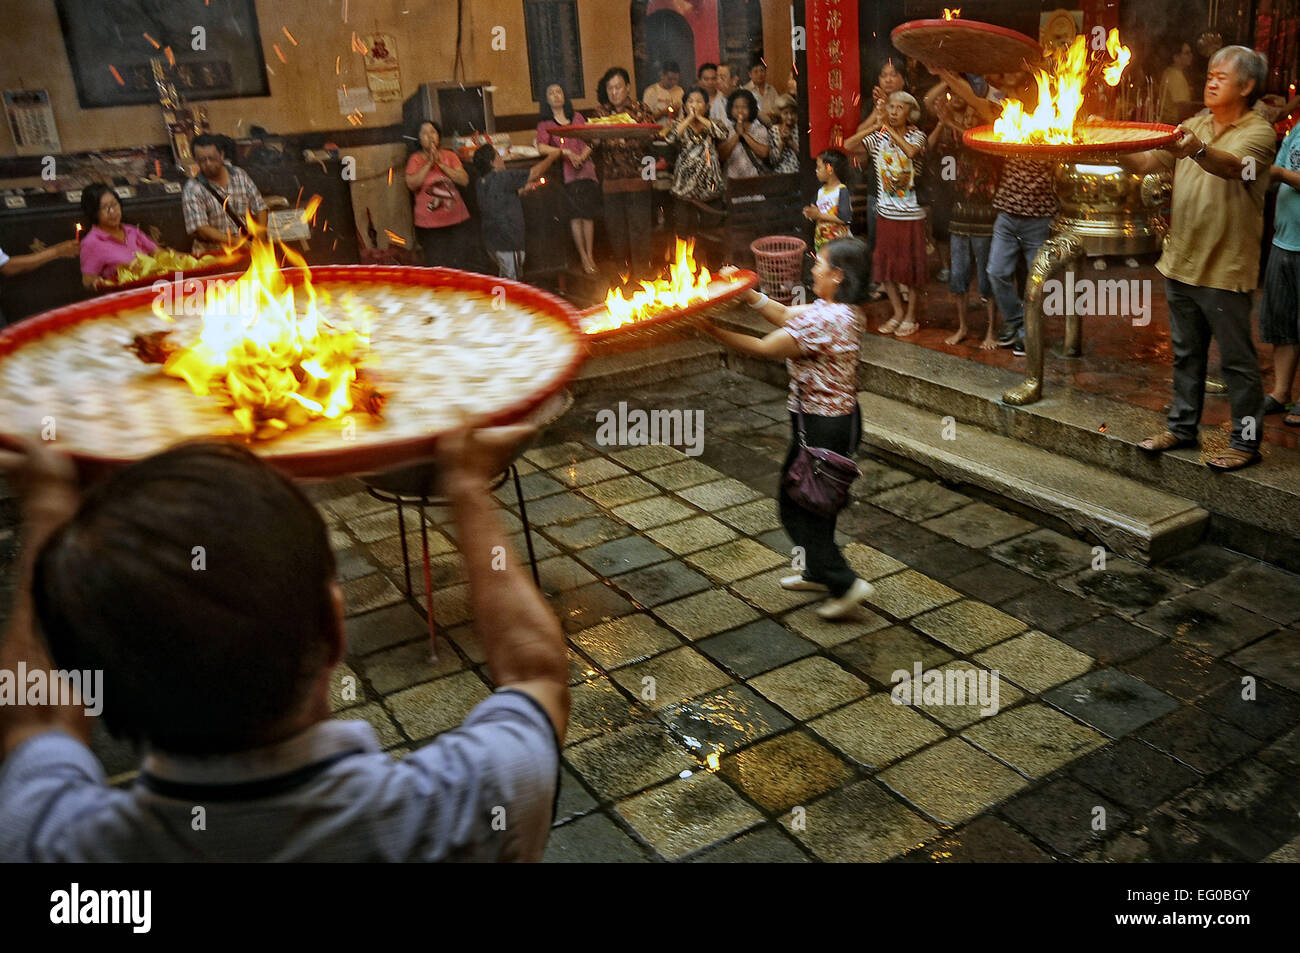 Semarang, Central Java, Indonesia. 12th Feb, 2015. CENTRAL JAVA, INDONESIA - FEBRUARY 12: Indonesia chinese prayer - Stock Image